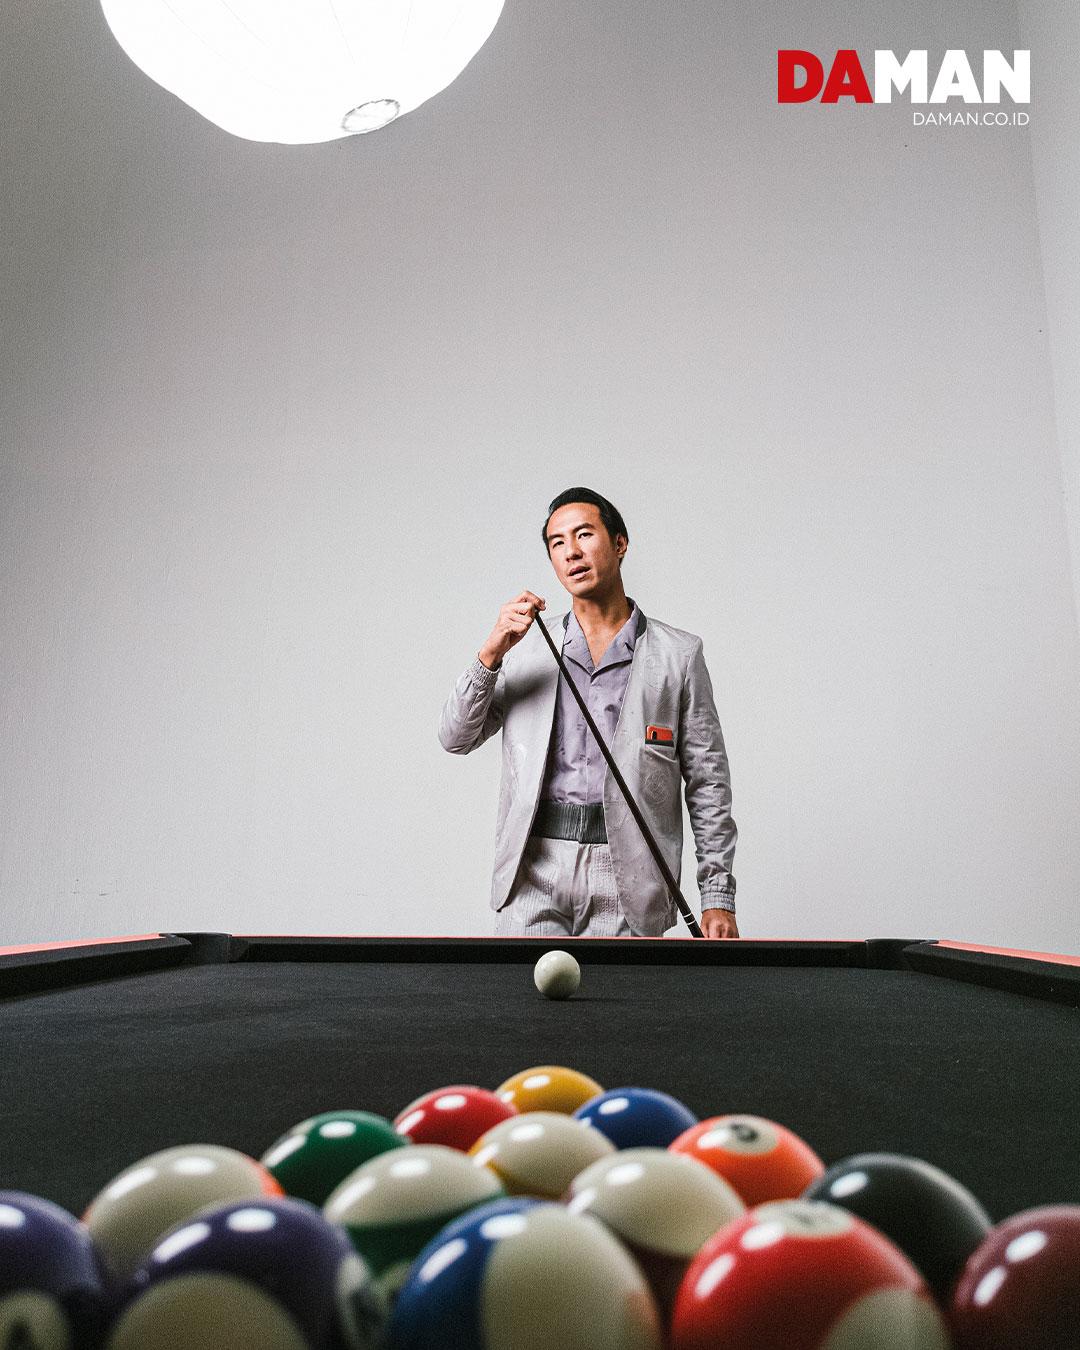 Outfit by Patrick Owen / Phone by OPPO Find X2 Pro / Billiard Table OPPO Patrick Owen with Tea Orange Vegan leather, Studio Intertu